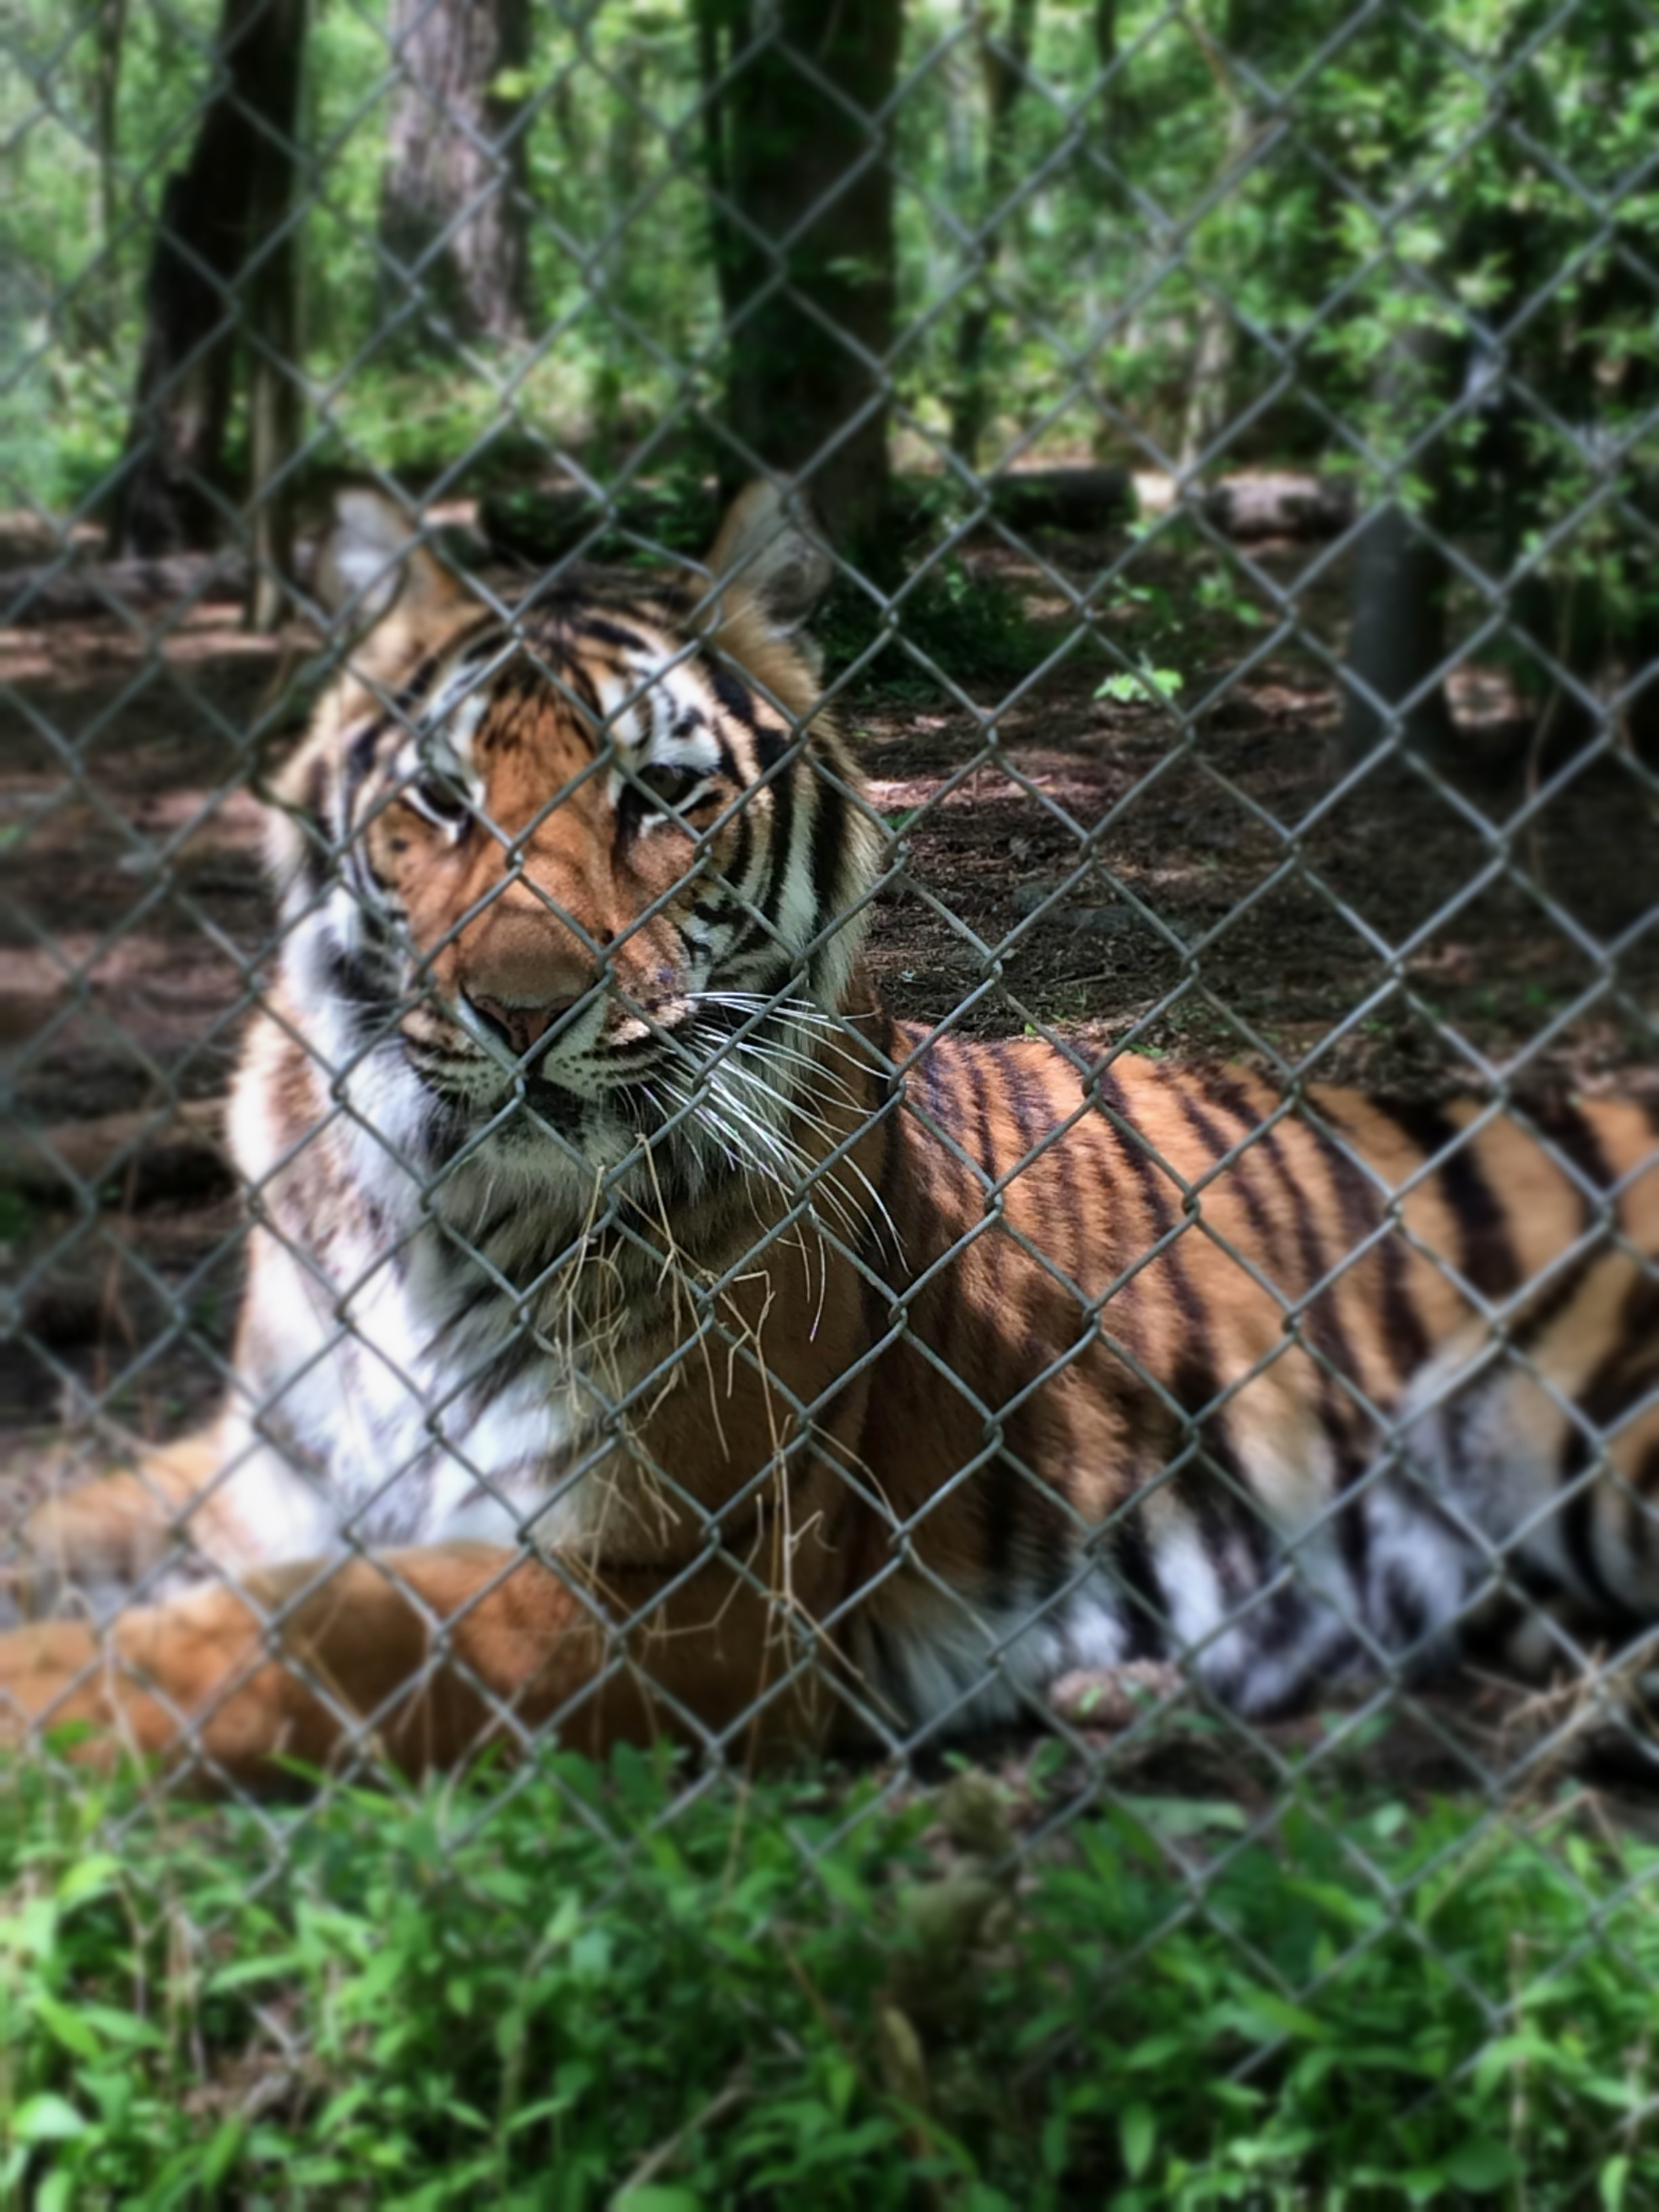 A Day with Tigers: Volunteering at Carolina Tiger Rescue | Viget